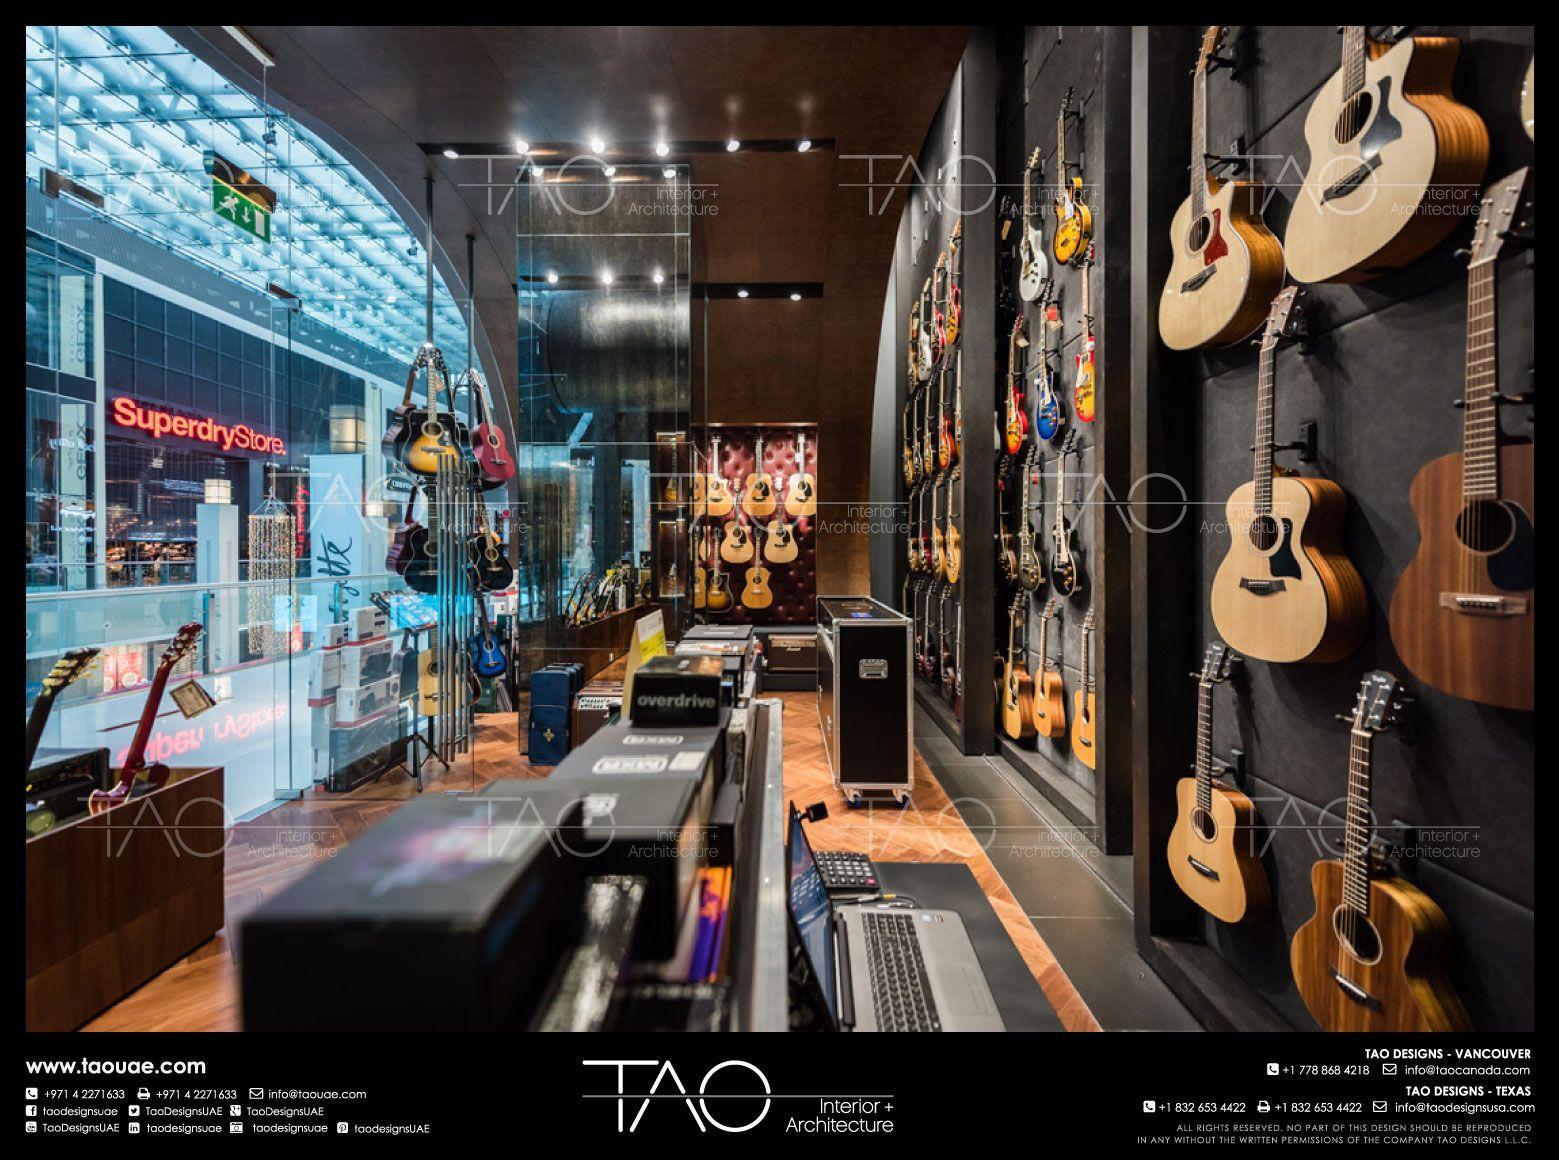 The Fretlight Wireless Guitar Store Guitar Store Guitar Wireless